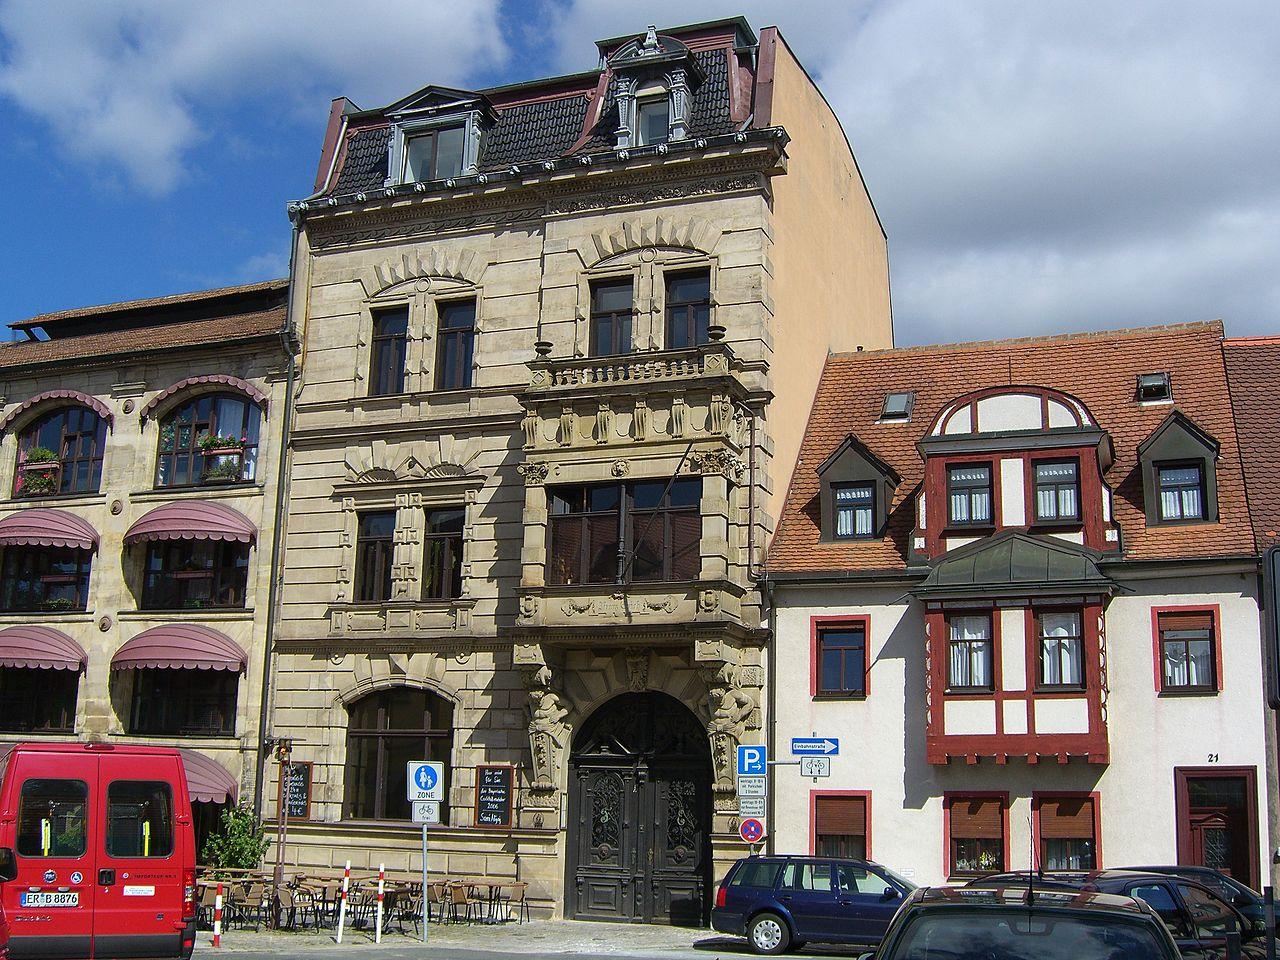 Strange File Erlangen Altstaedter Kirchplatz Different Houses Largest Home Design Picture Inspirations Pitcheantrous